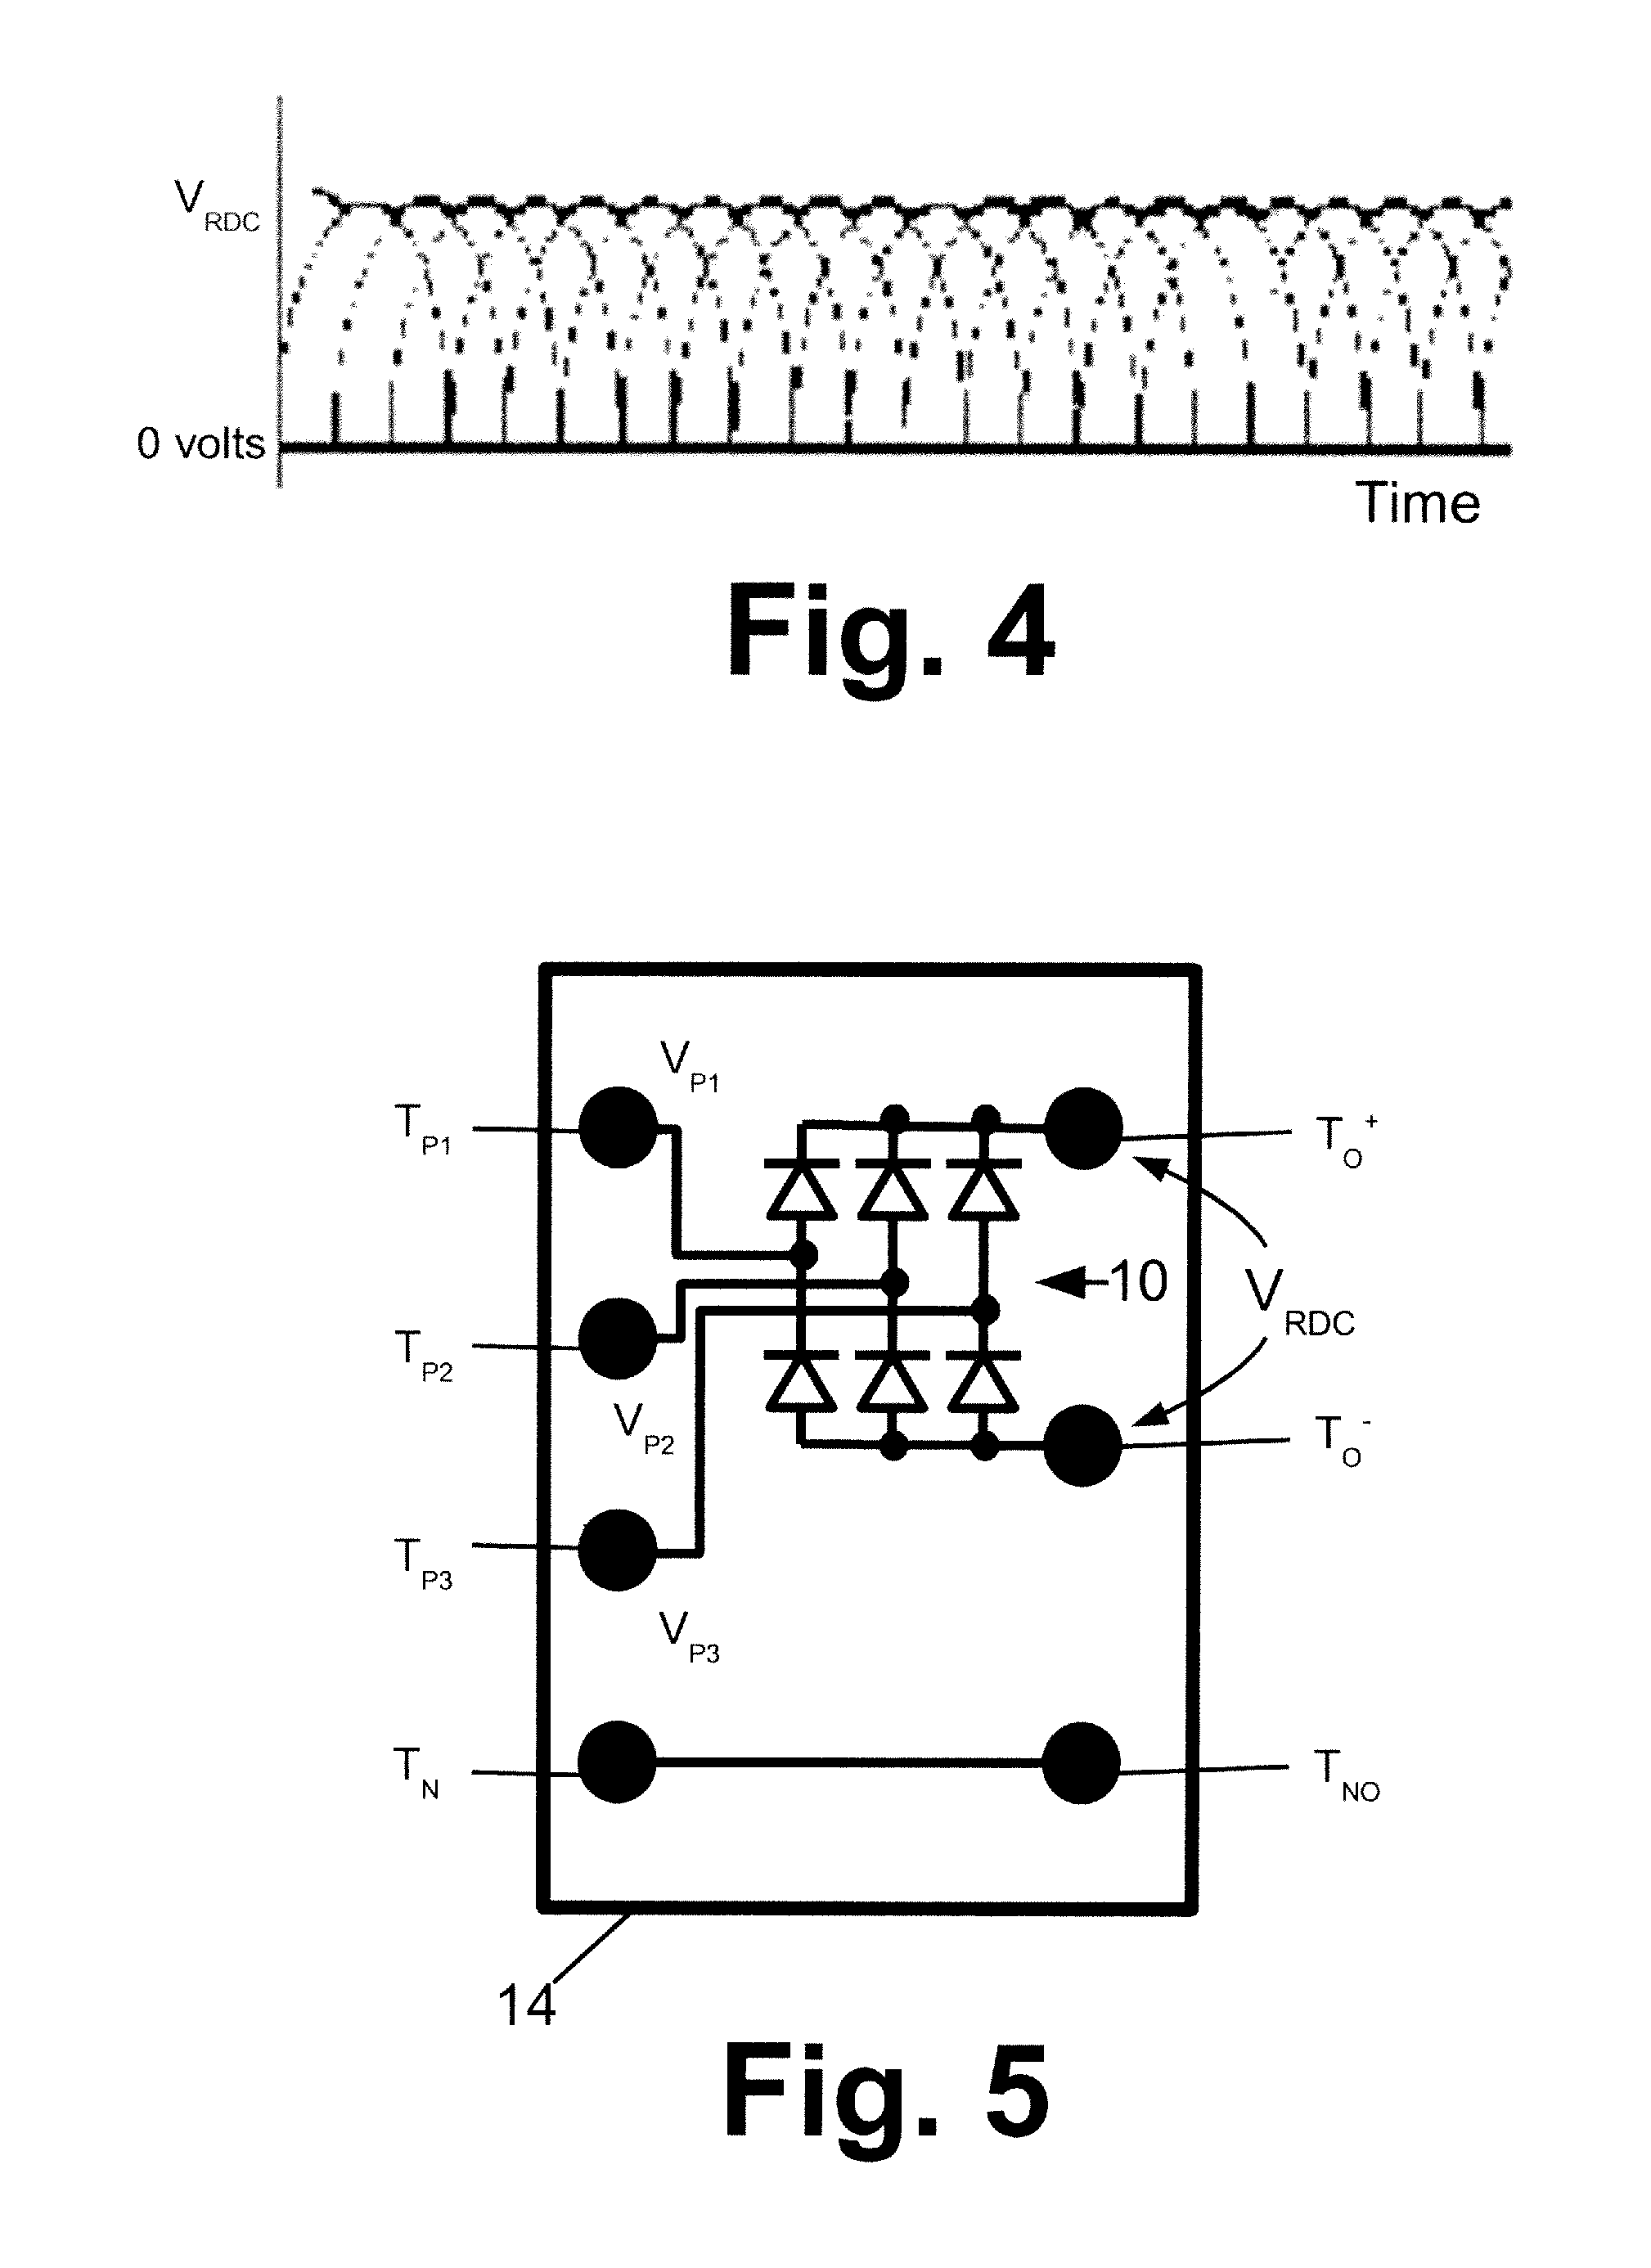 Phillip Ballast Wiring Diagram Single Phase 208